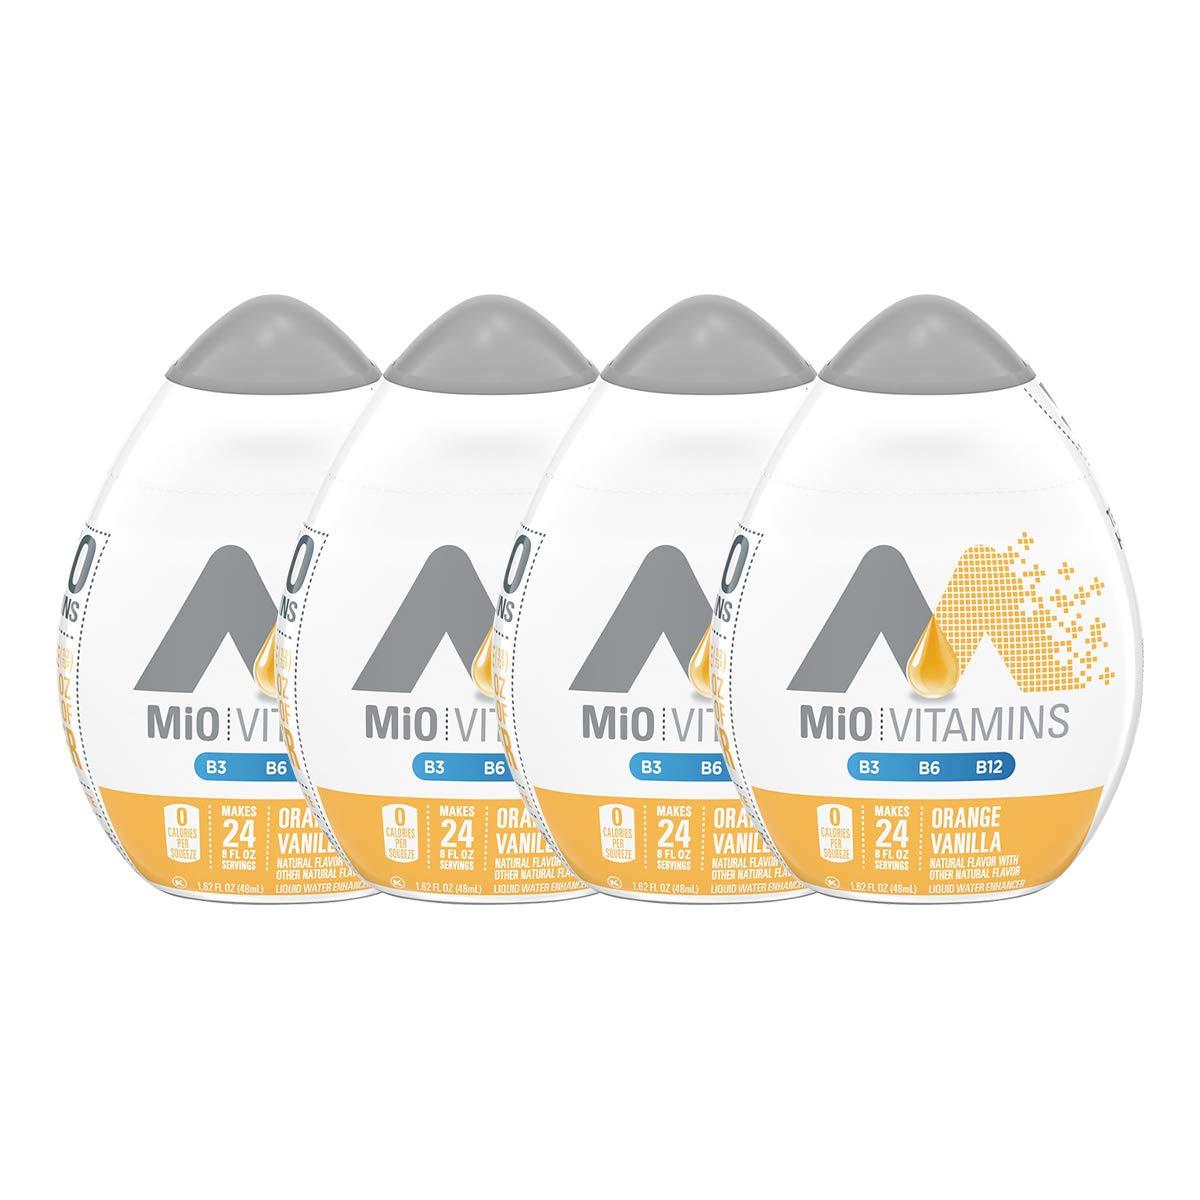 Mio Energy Liquid Water Enhancer, Orange Vanilla (Pack of 4)